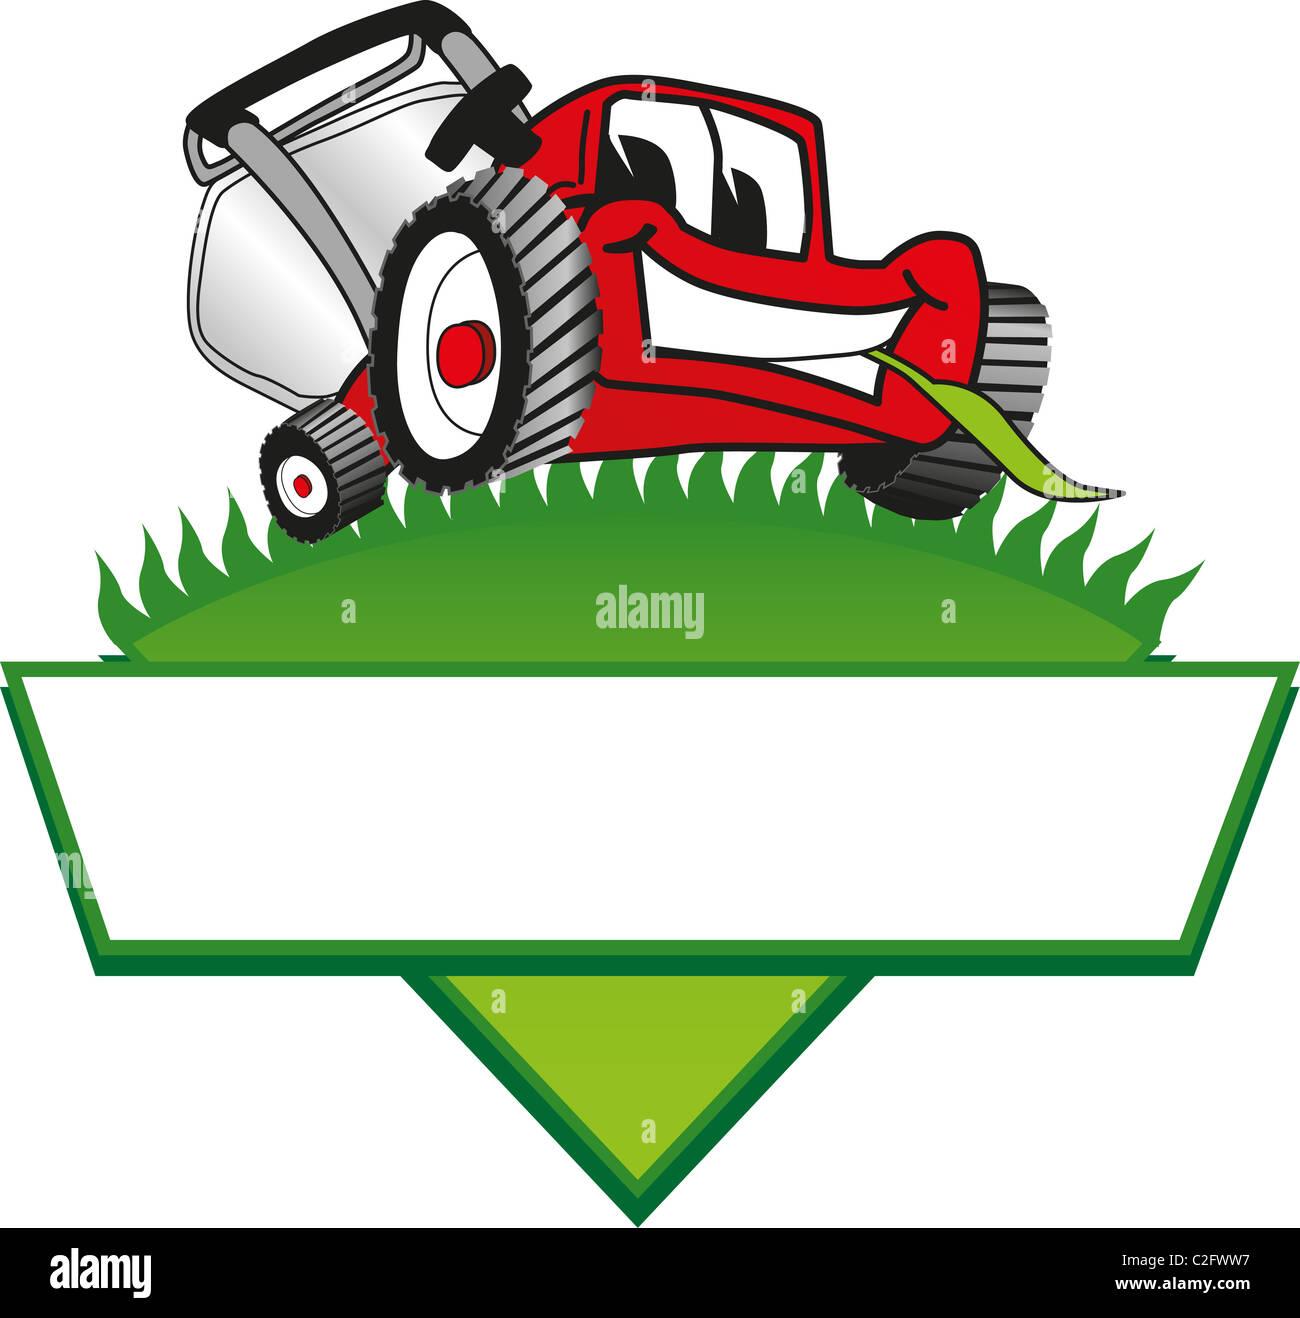 cartoon lawn mower logo template stock photo 35999635 alamy rh alamy com lawn care logos lawn care logos vector